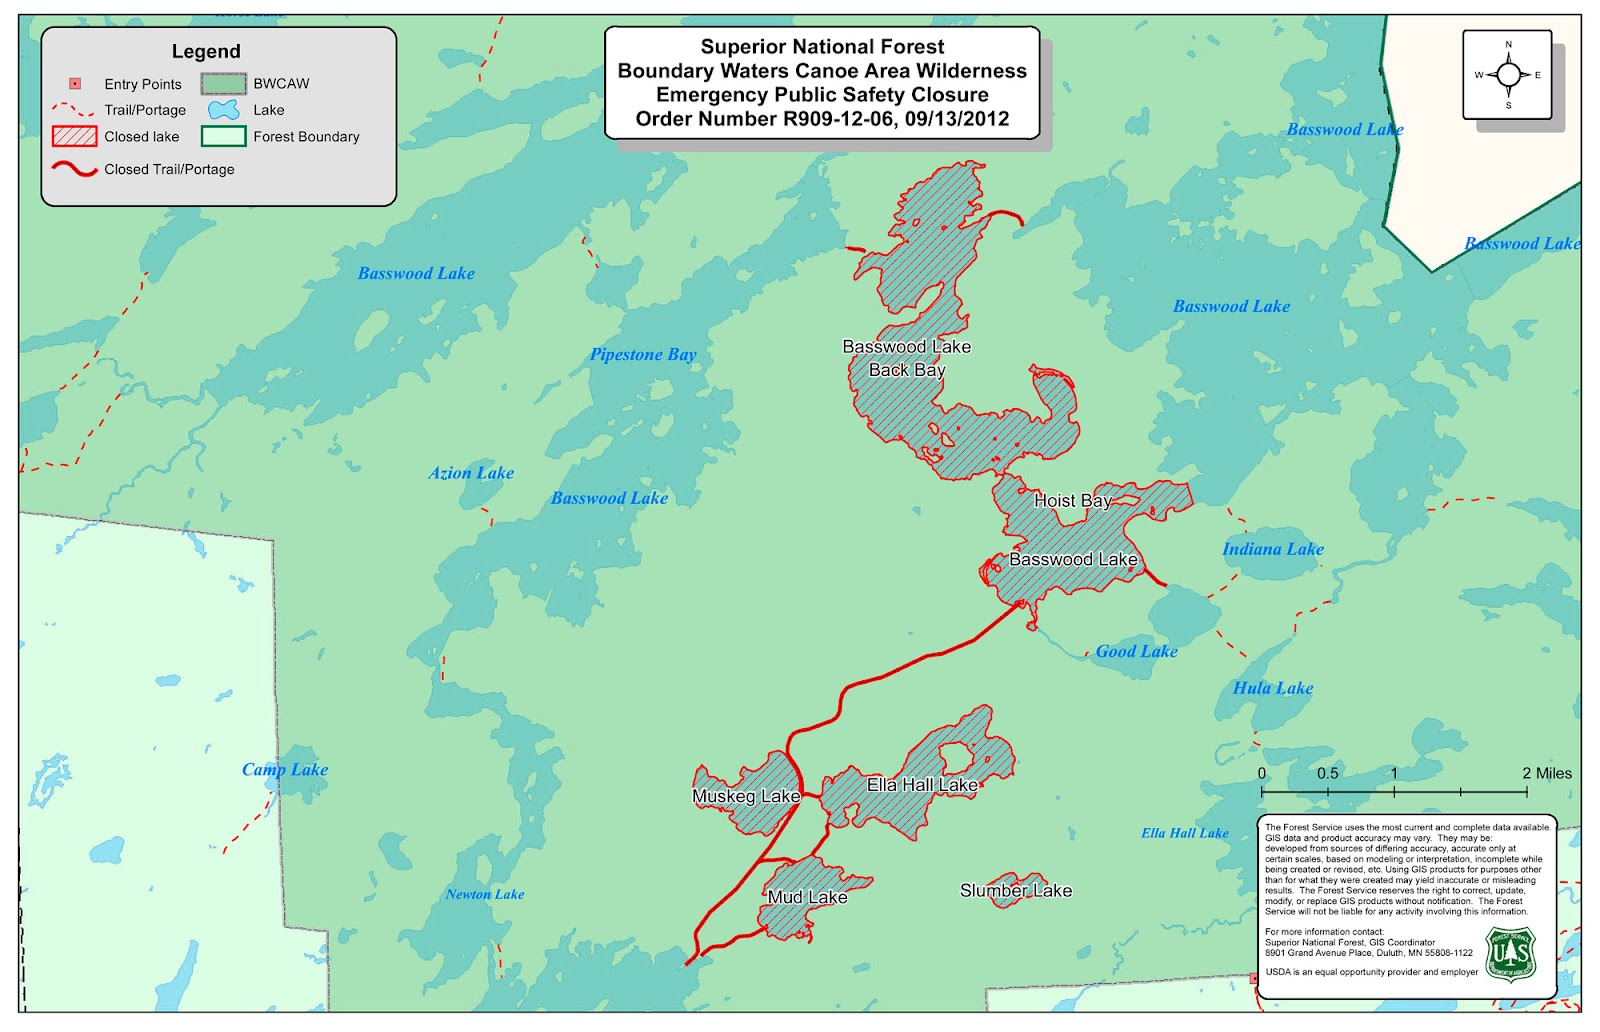 Grand Lake Fire Map.Piragis Northwoods Company Boundary Waters Blog Boundary Waters